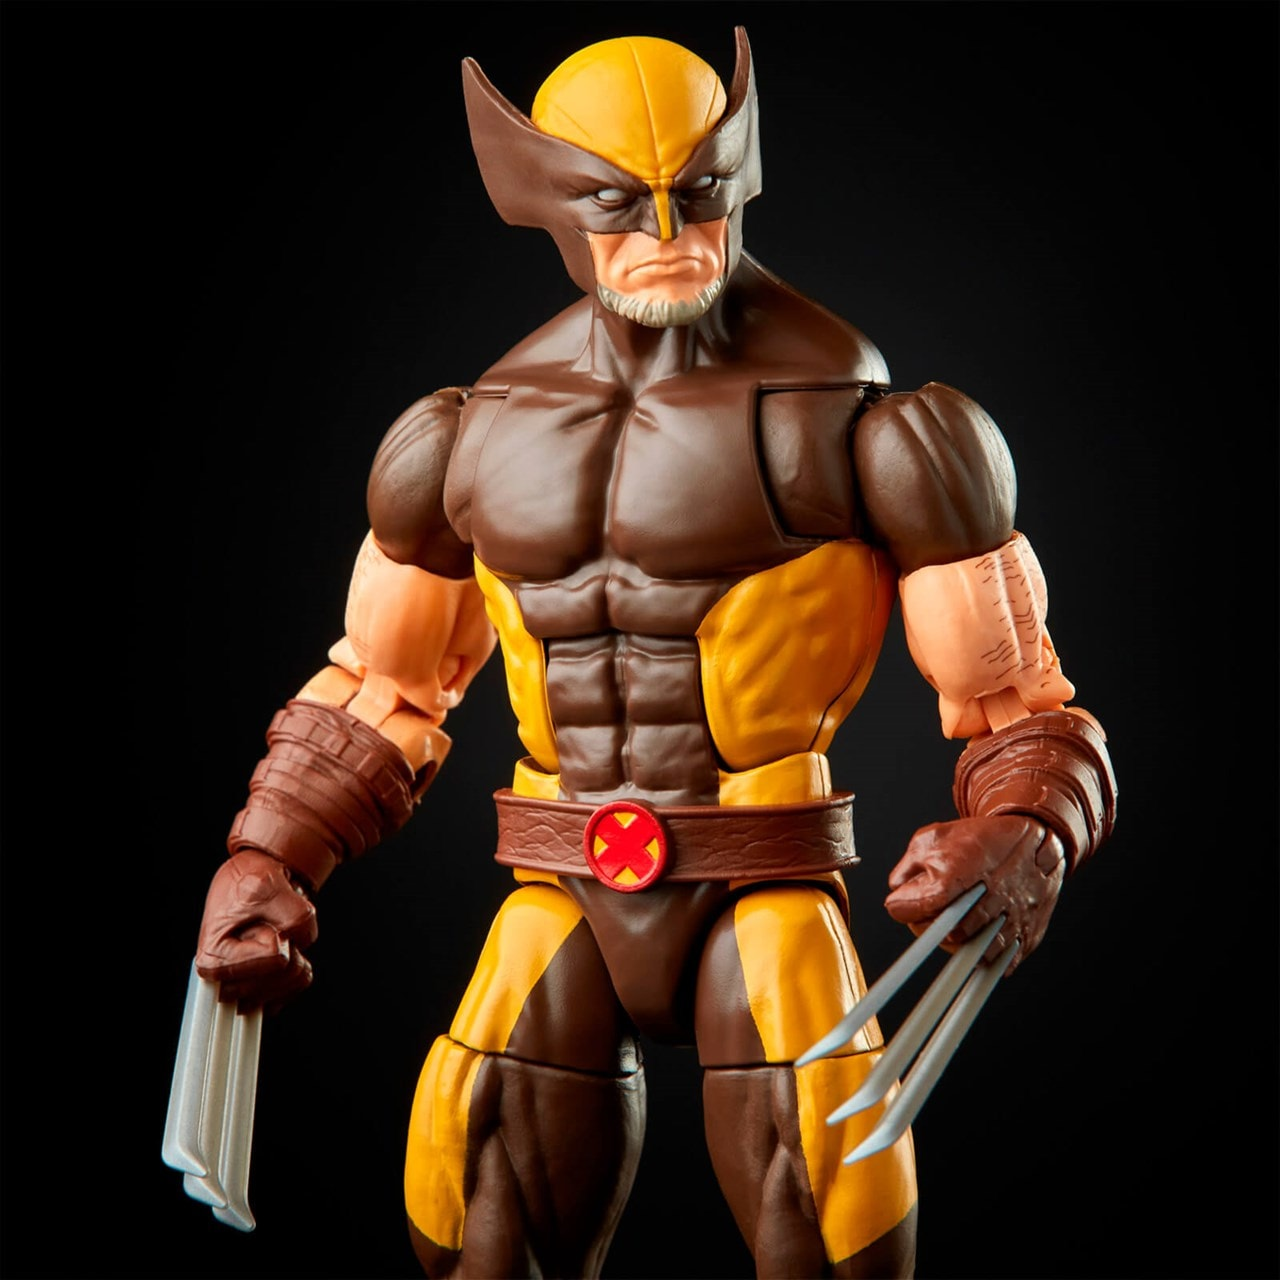 Marvel Legends Series X-Men Wolverine Action Figure - 4